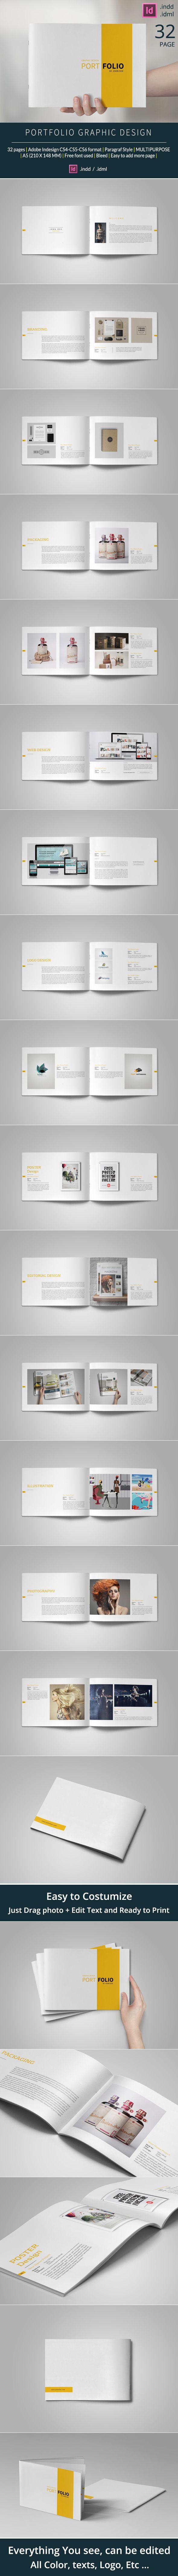 Best 25 Graphic Design Cv Ideas On Pinterest Resume Design